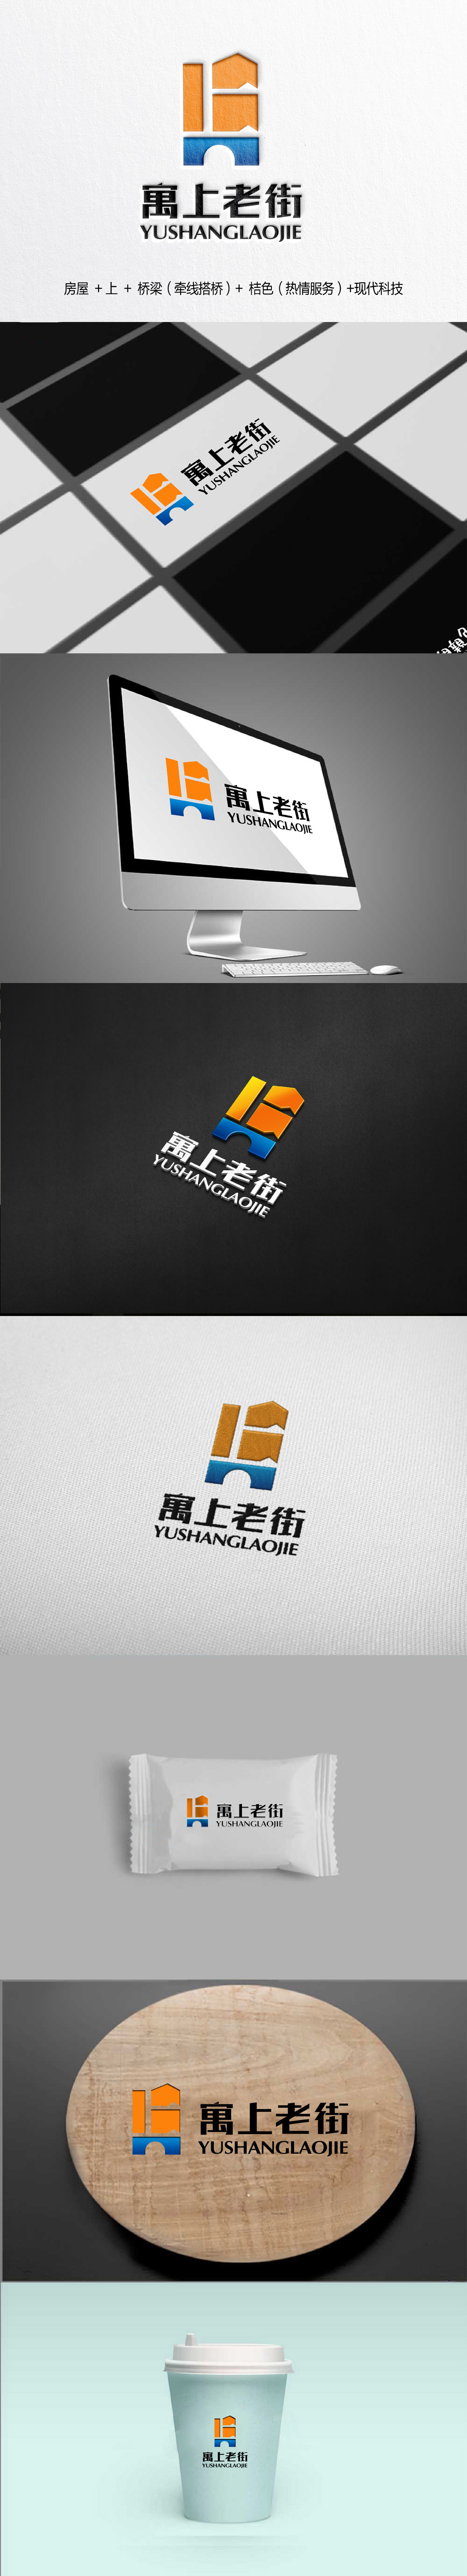 logo设计_3022802_k68威客网